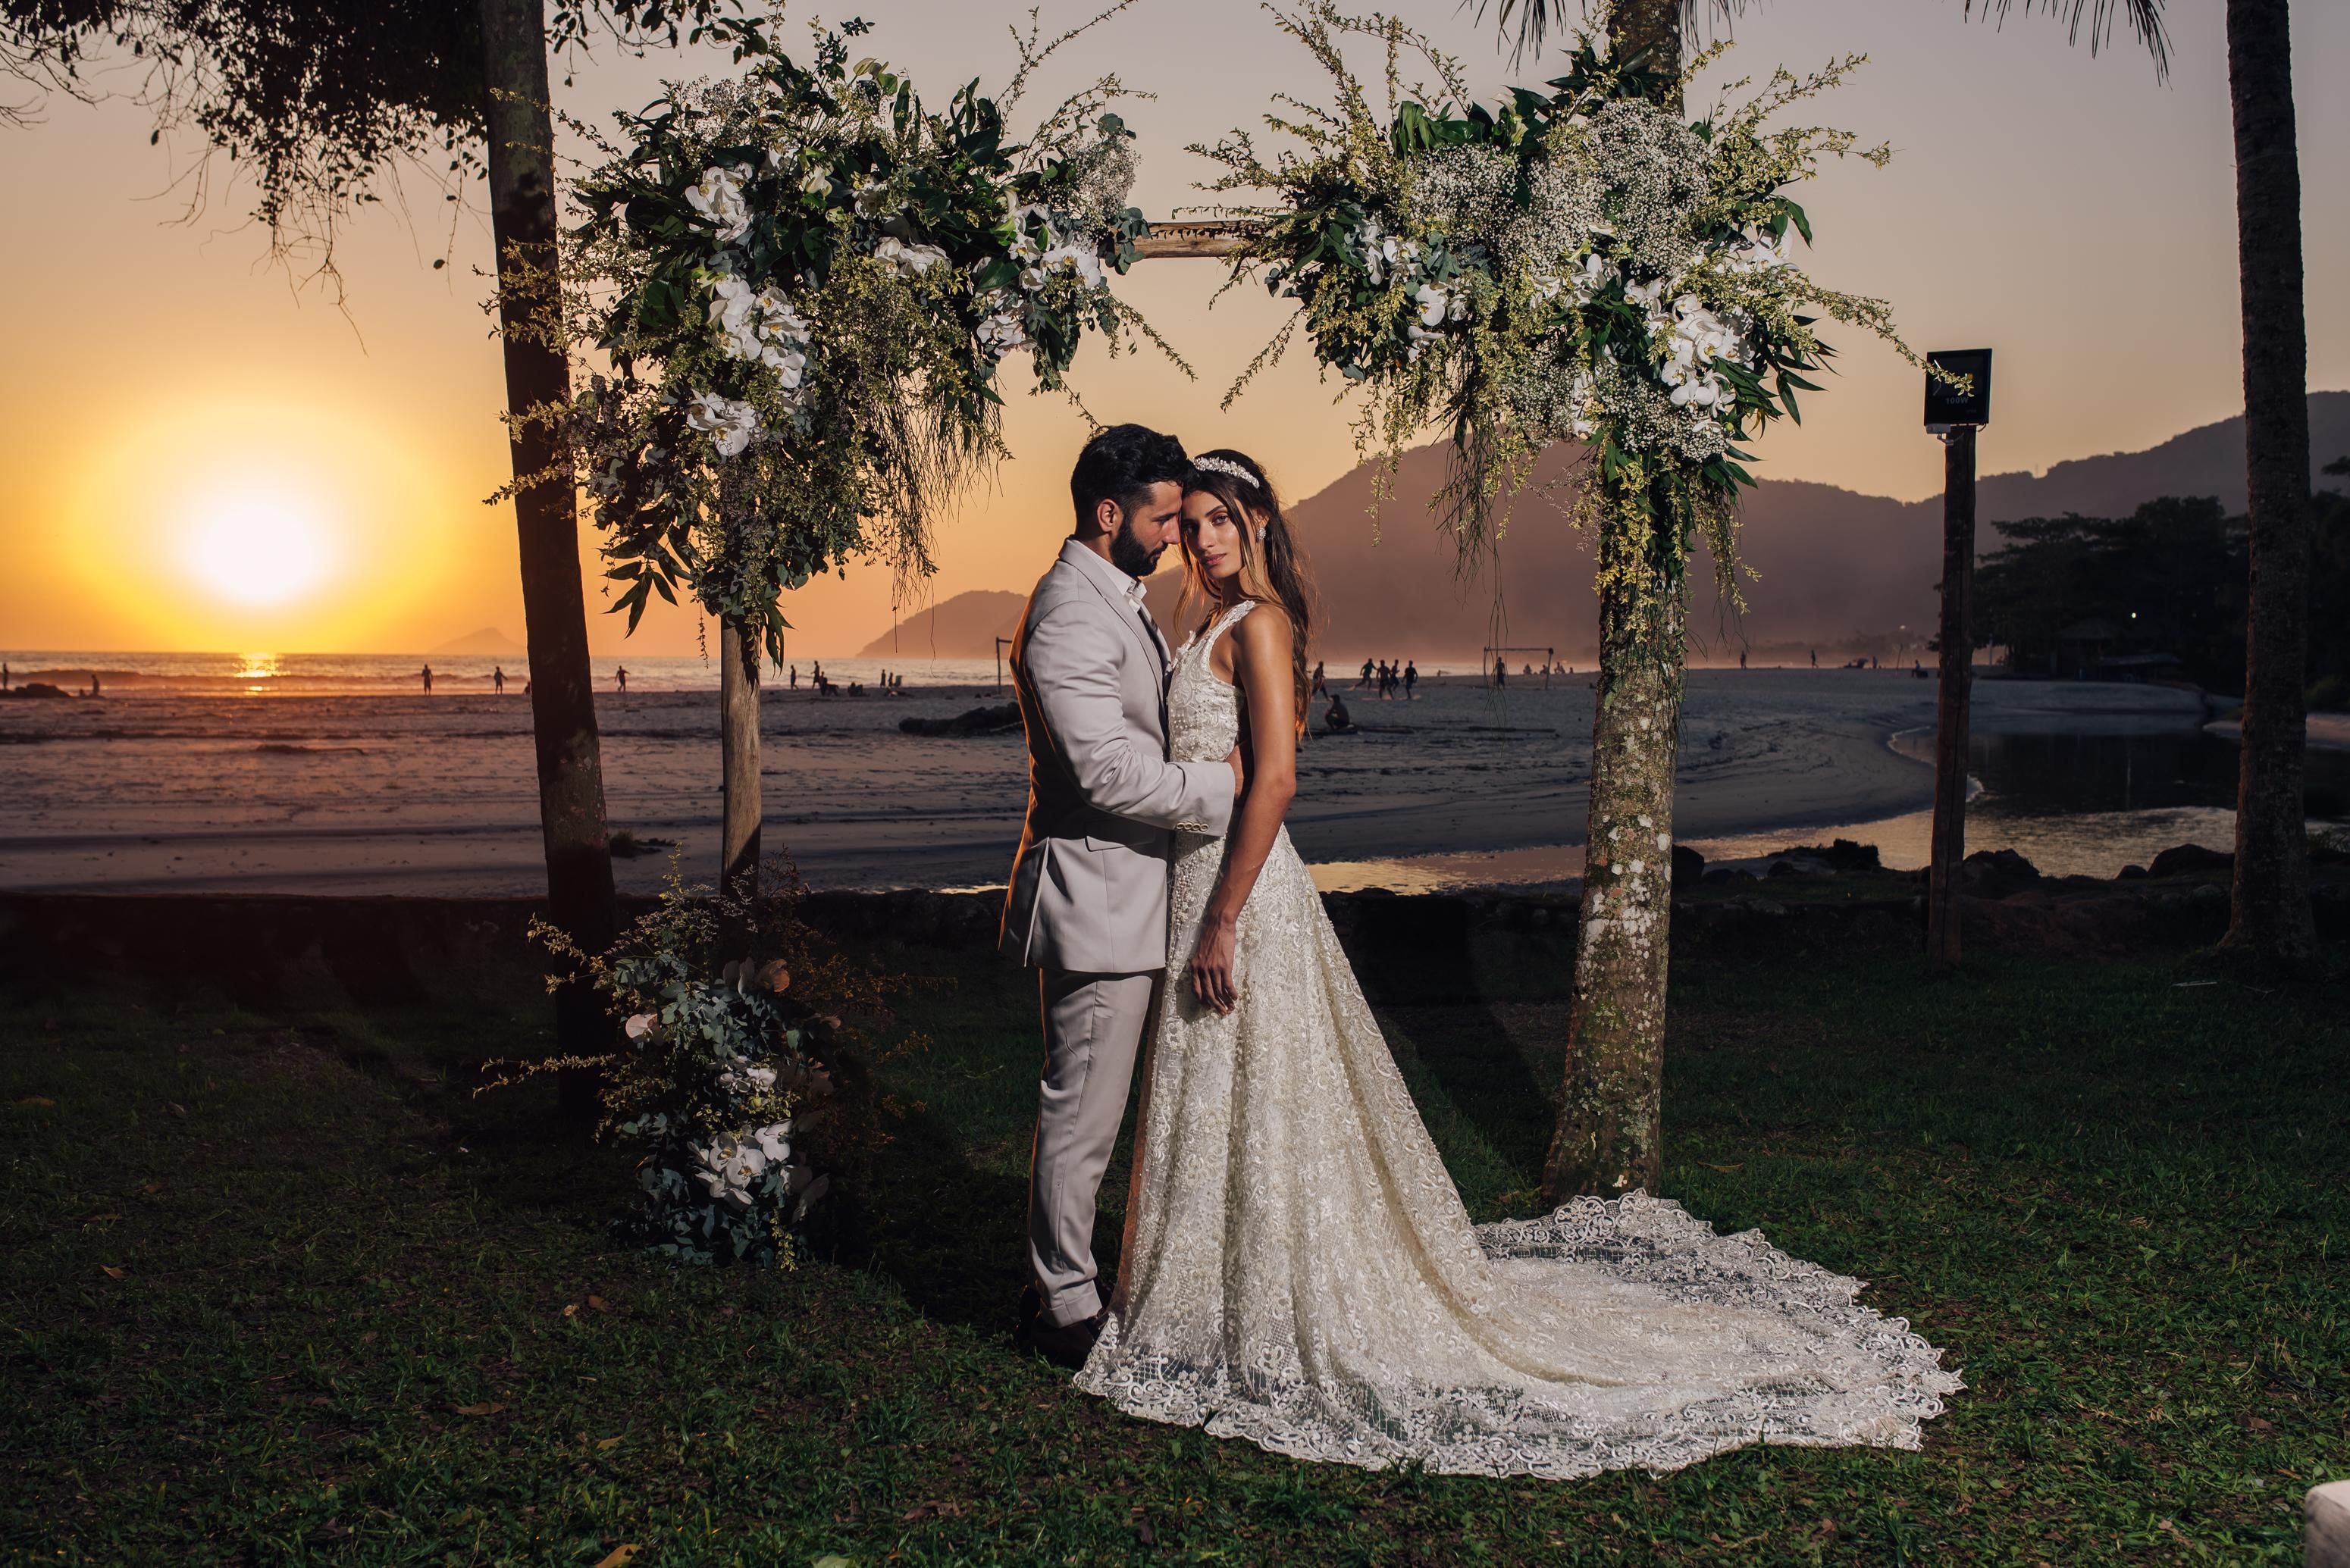 Destination wedding na praia sem sair do Brasil